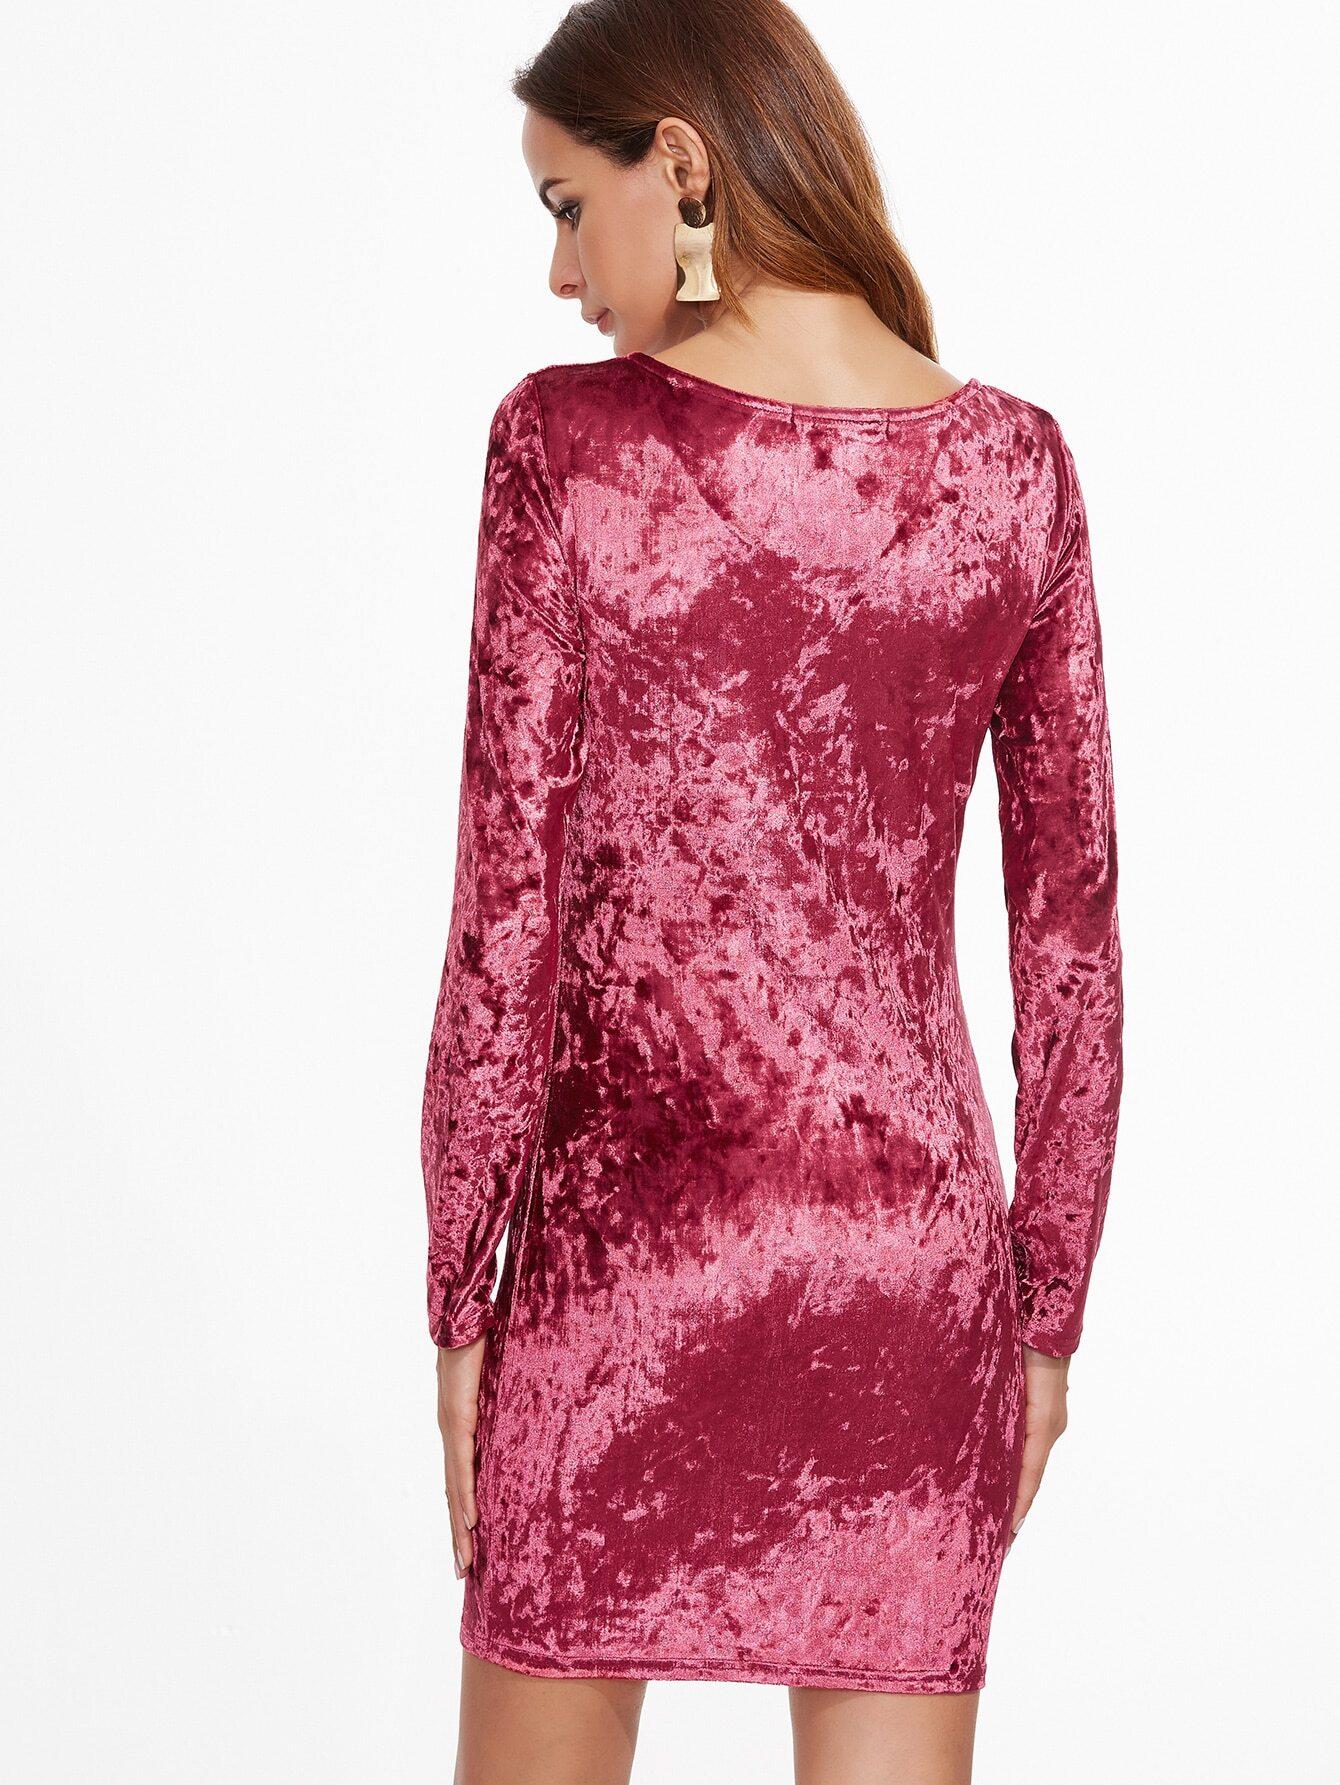 Distributors reviews long bodycon dresses plus size silver mustard color